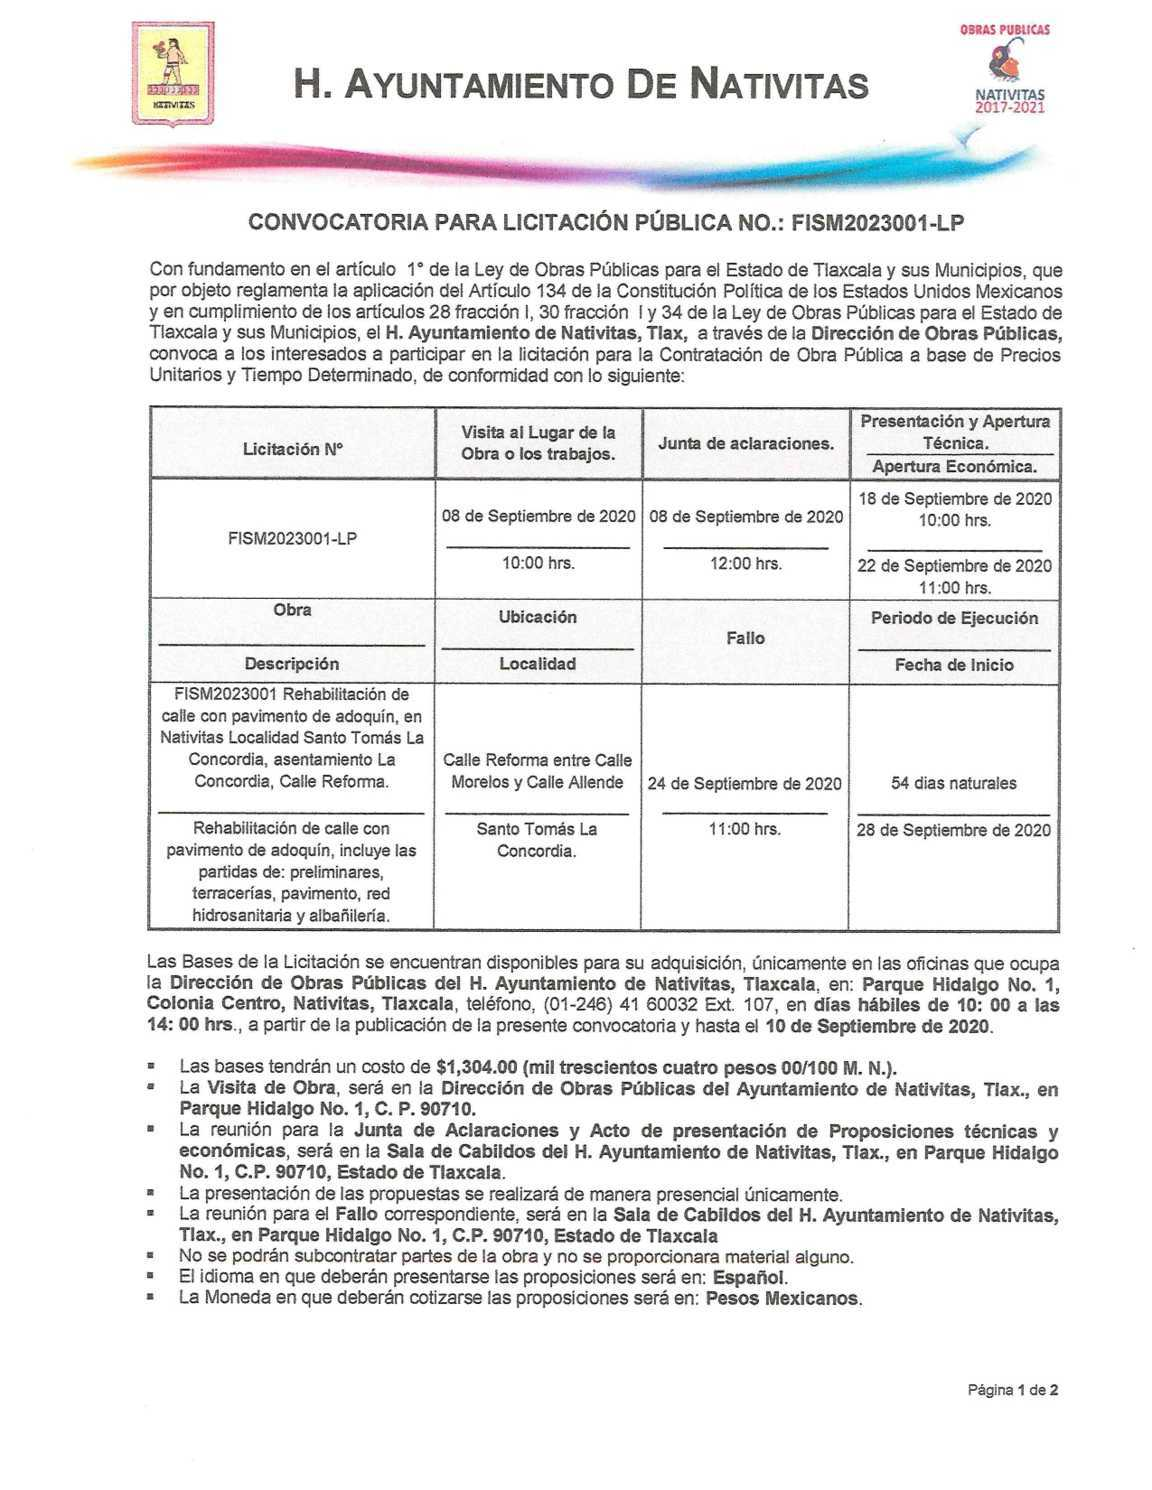 Nativitas lanza convocatoria para licitación de obra publica